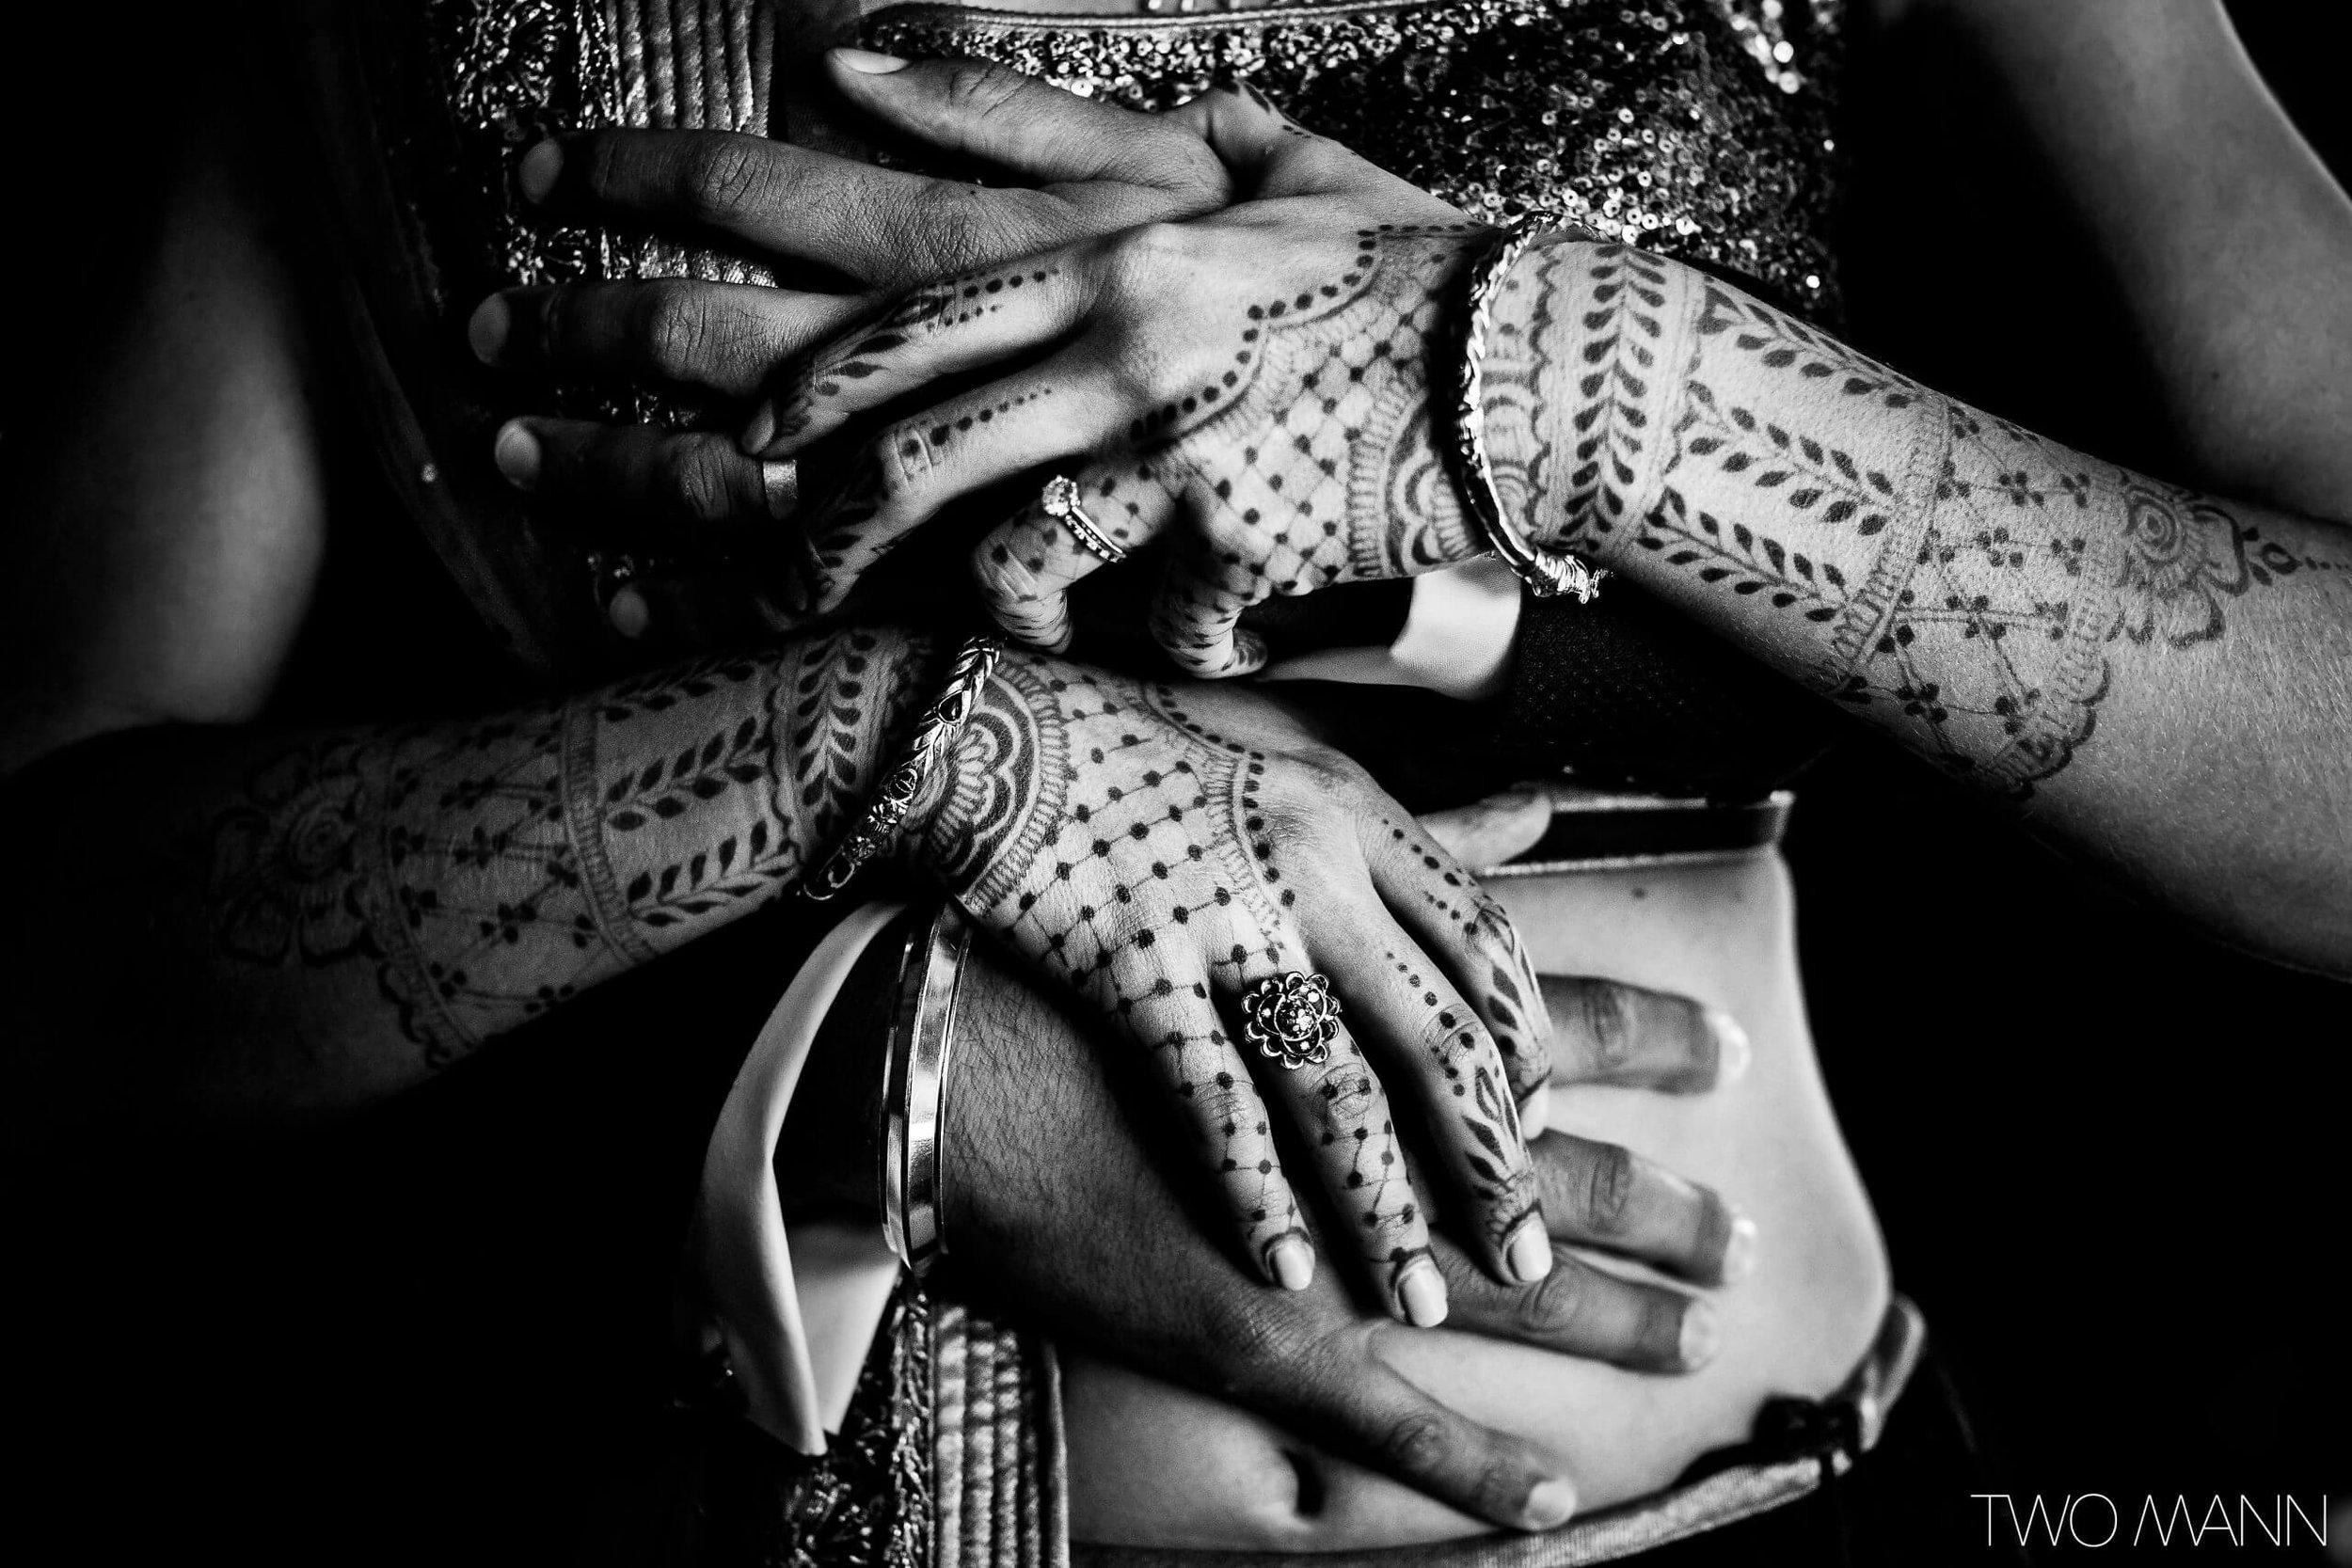 Two-Mann-Studios-Worlds-Best-Wedding-Photography-Best-of-2016-092-2560x1707.jpg